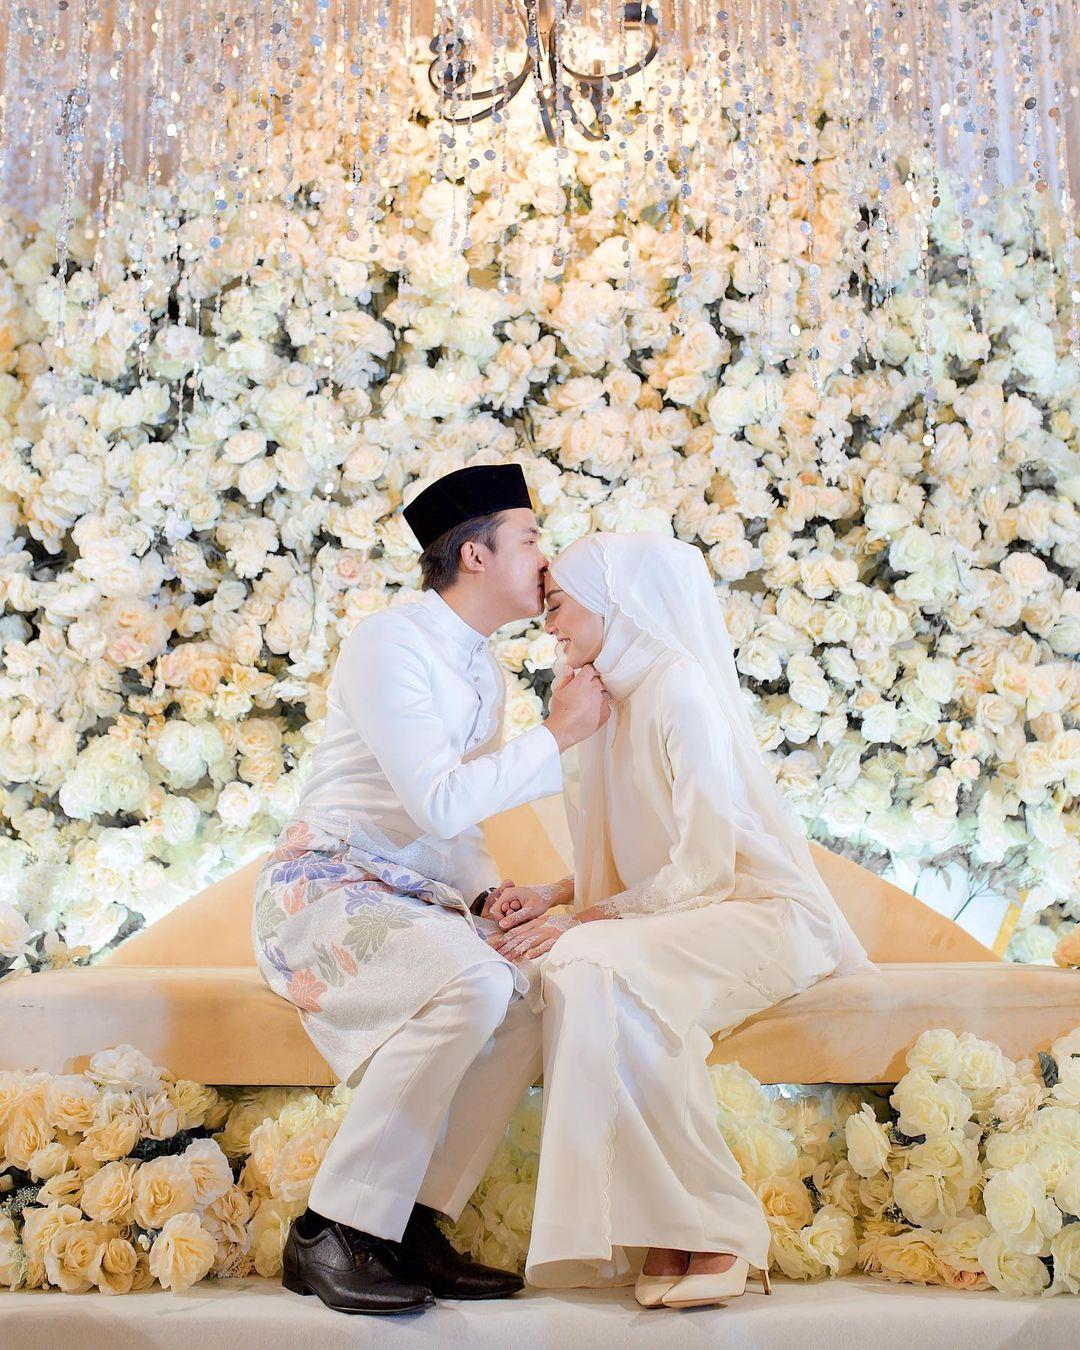 [VIDEO]7 Kali Tangguh Hasrat Nikah, Majlis Buat Sehari Sebelum PKP Tetap Meriah